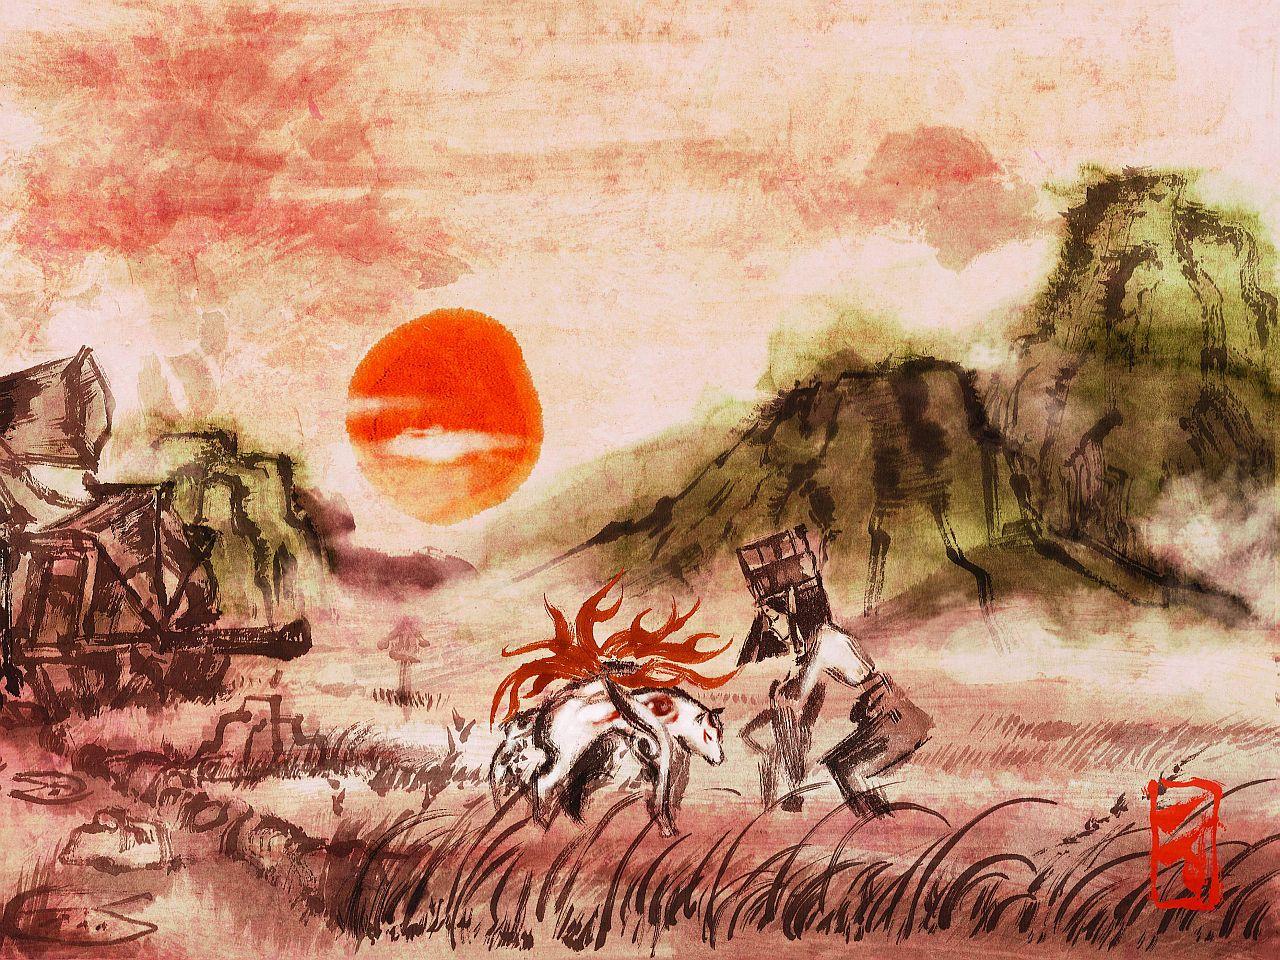 Okami (Quelle: Cloverstudios Okami Official Complete Works)